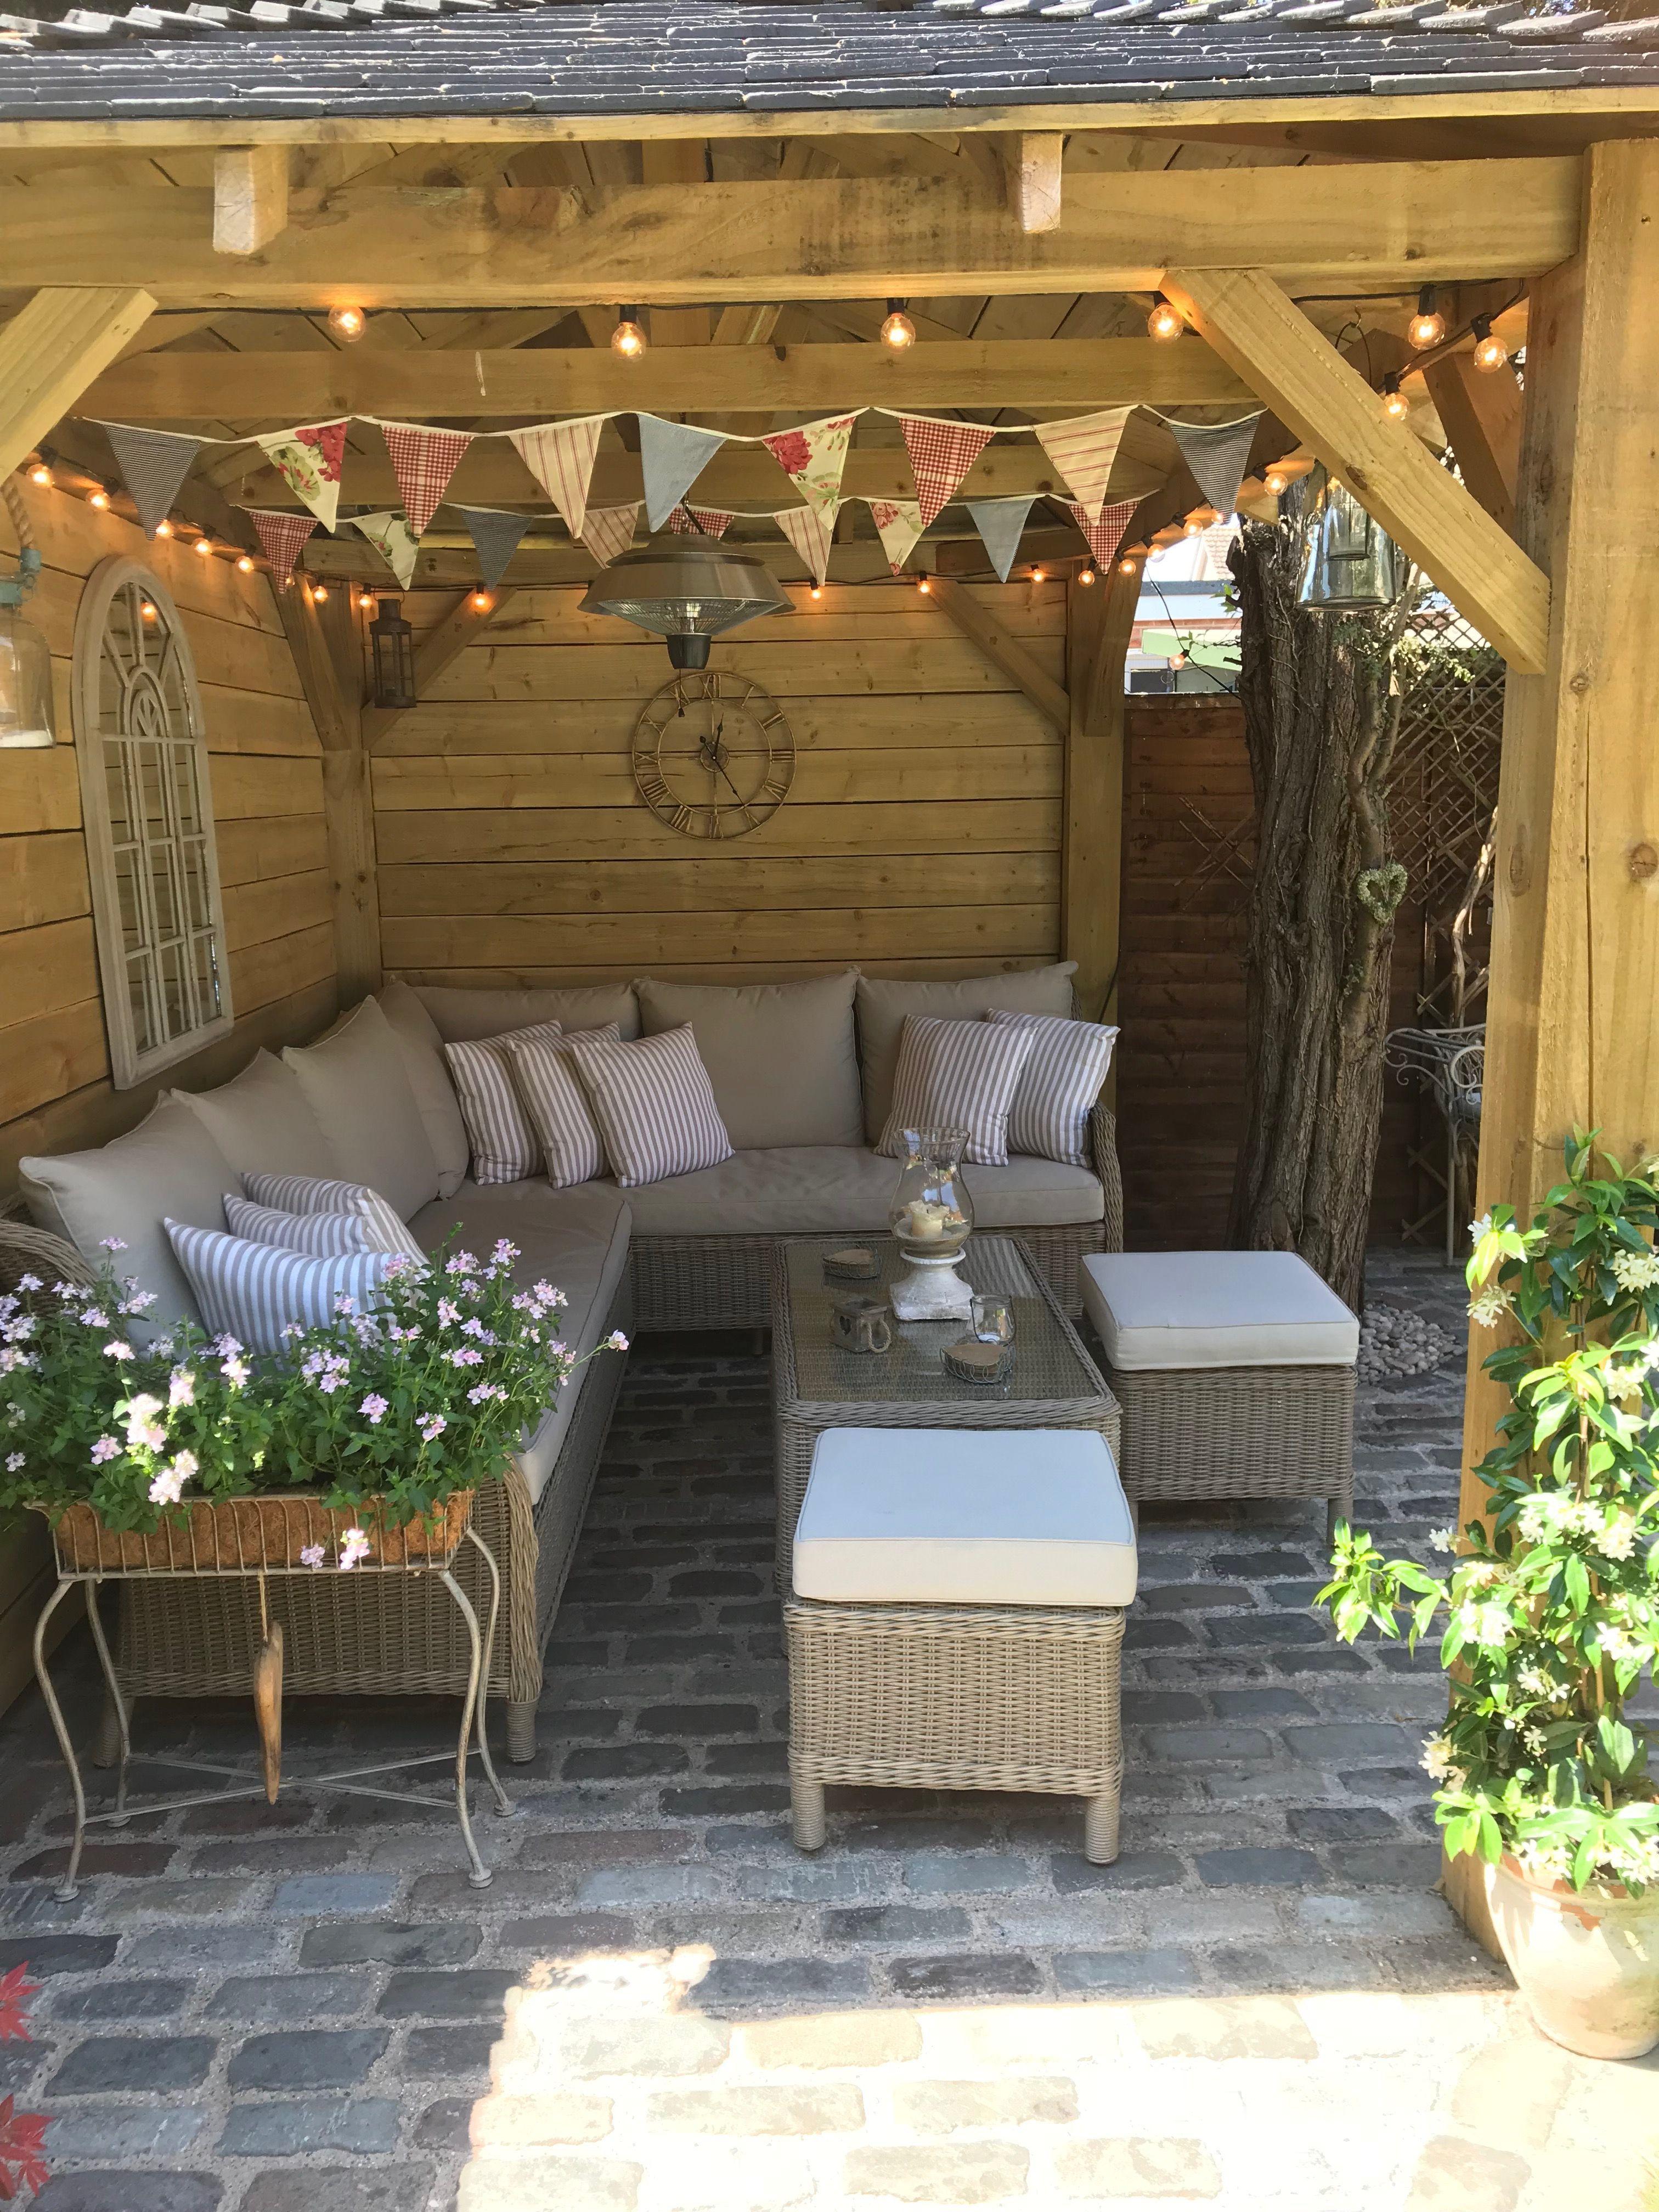 Cottage garden gazebo, homemade, bunting, outdoor seating ...